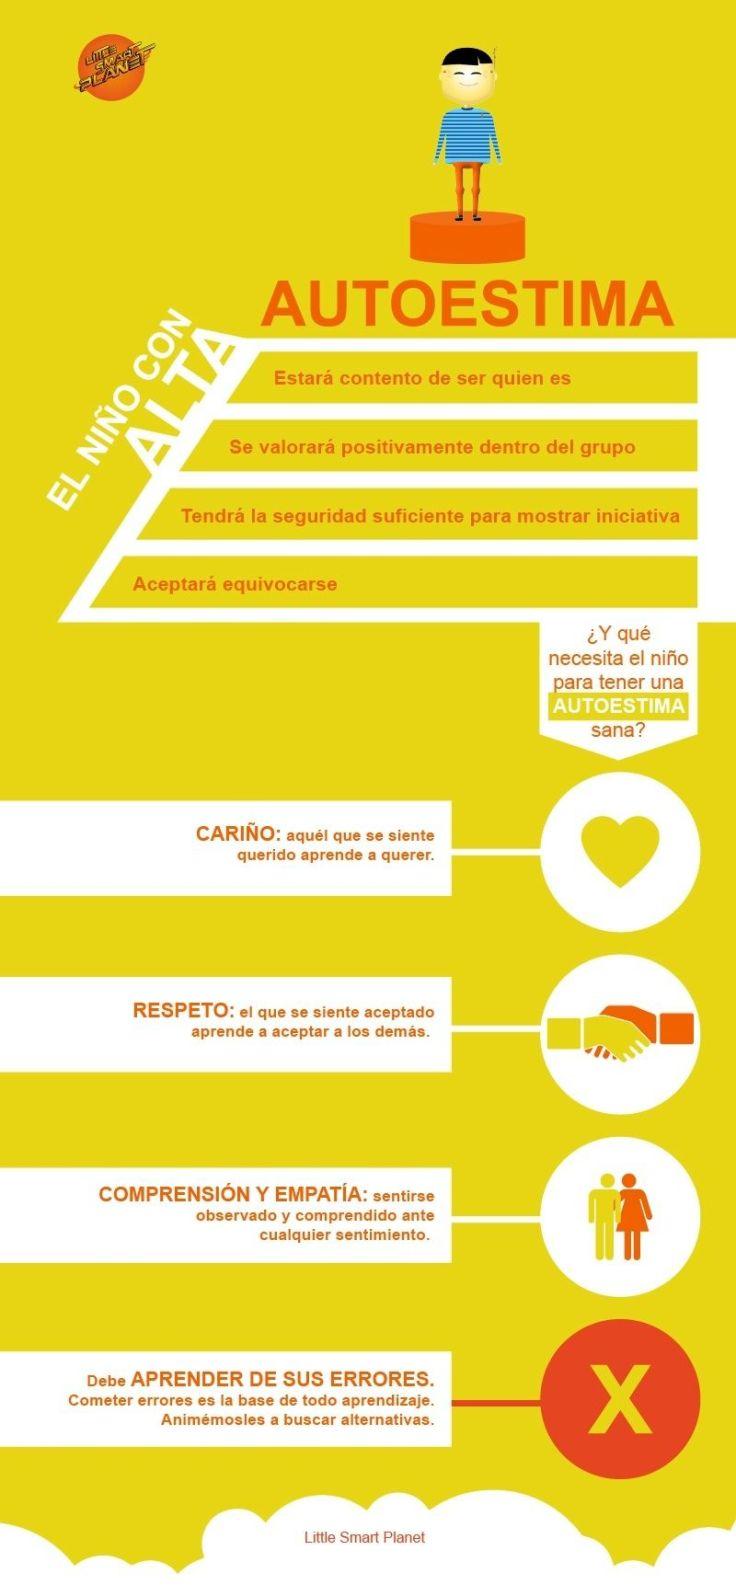 AutoestimaNiñosTipsFomentarla-Infografía-BlogGesvin